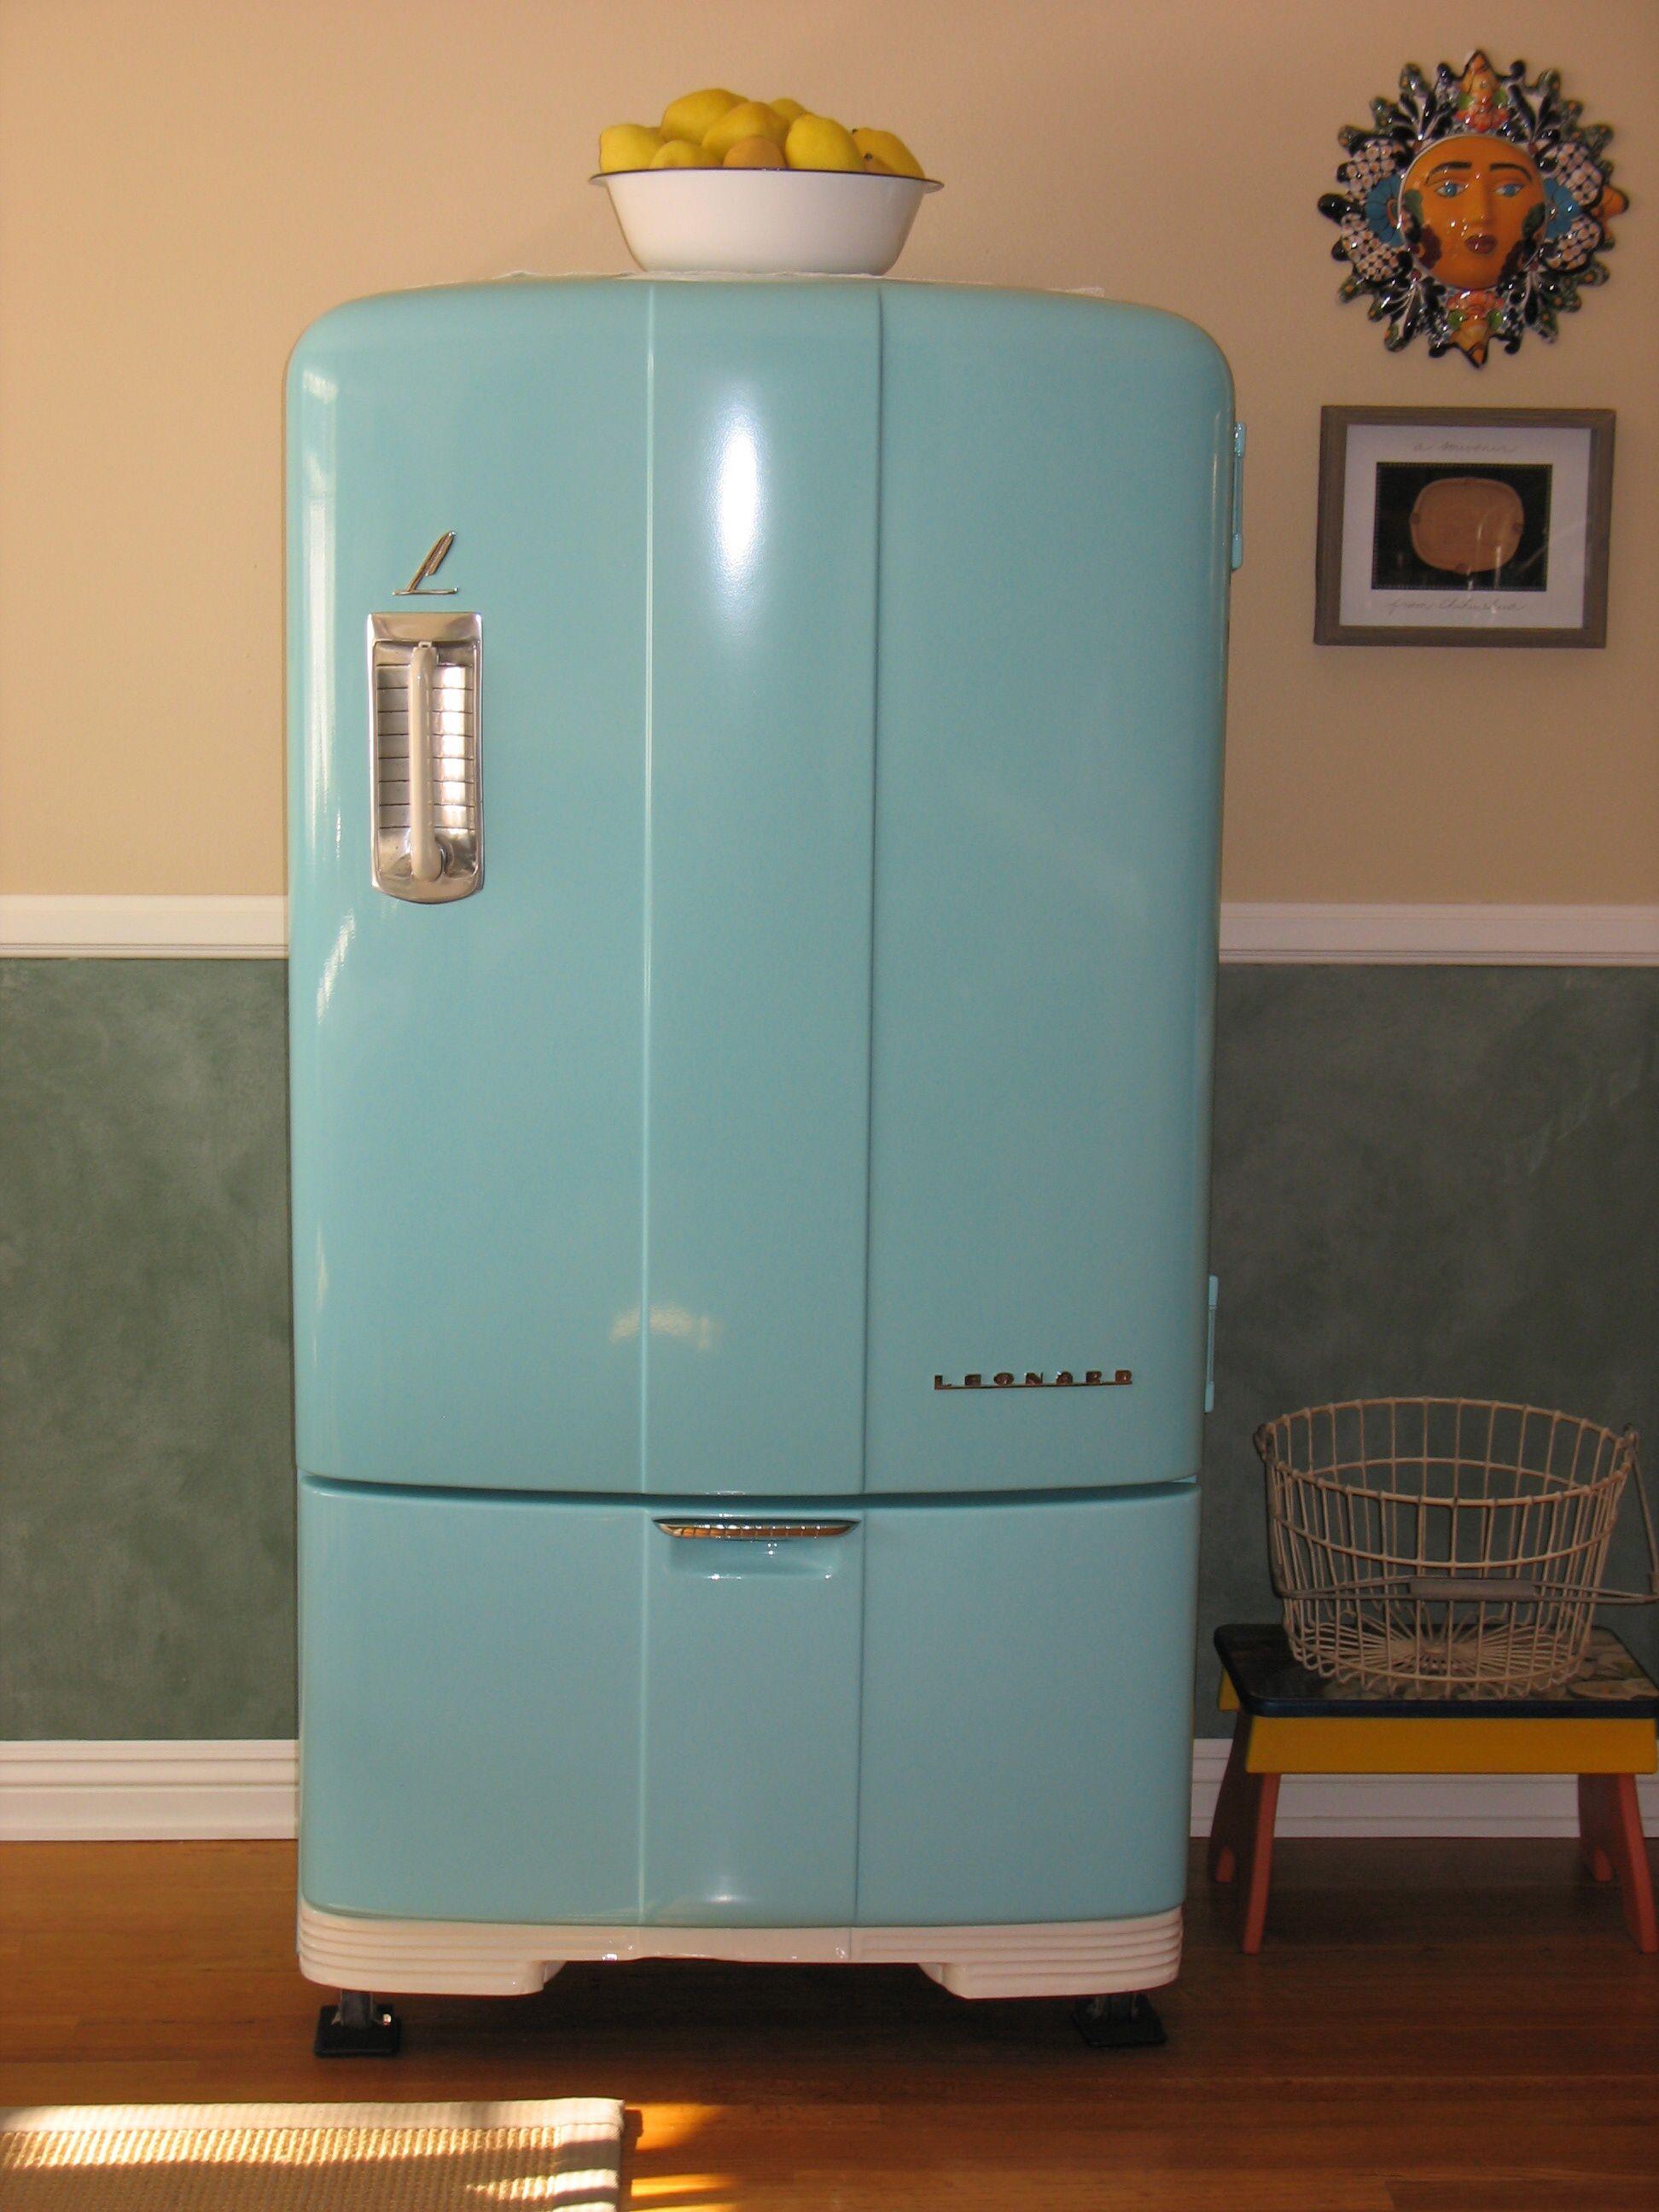 1946 Leonard Refrigerator Kitchens In 2019 Home Decor